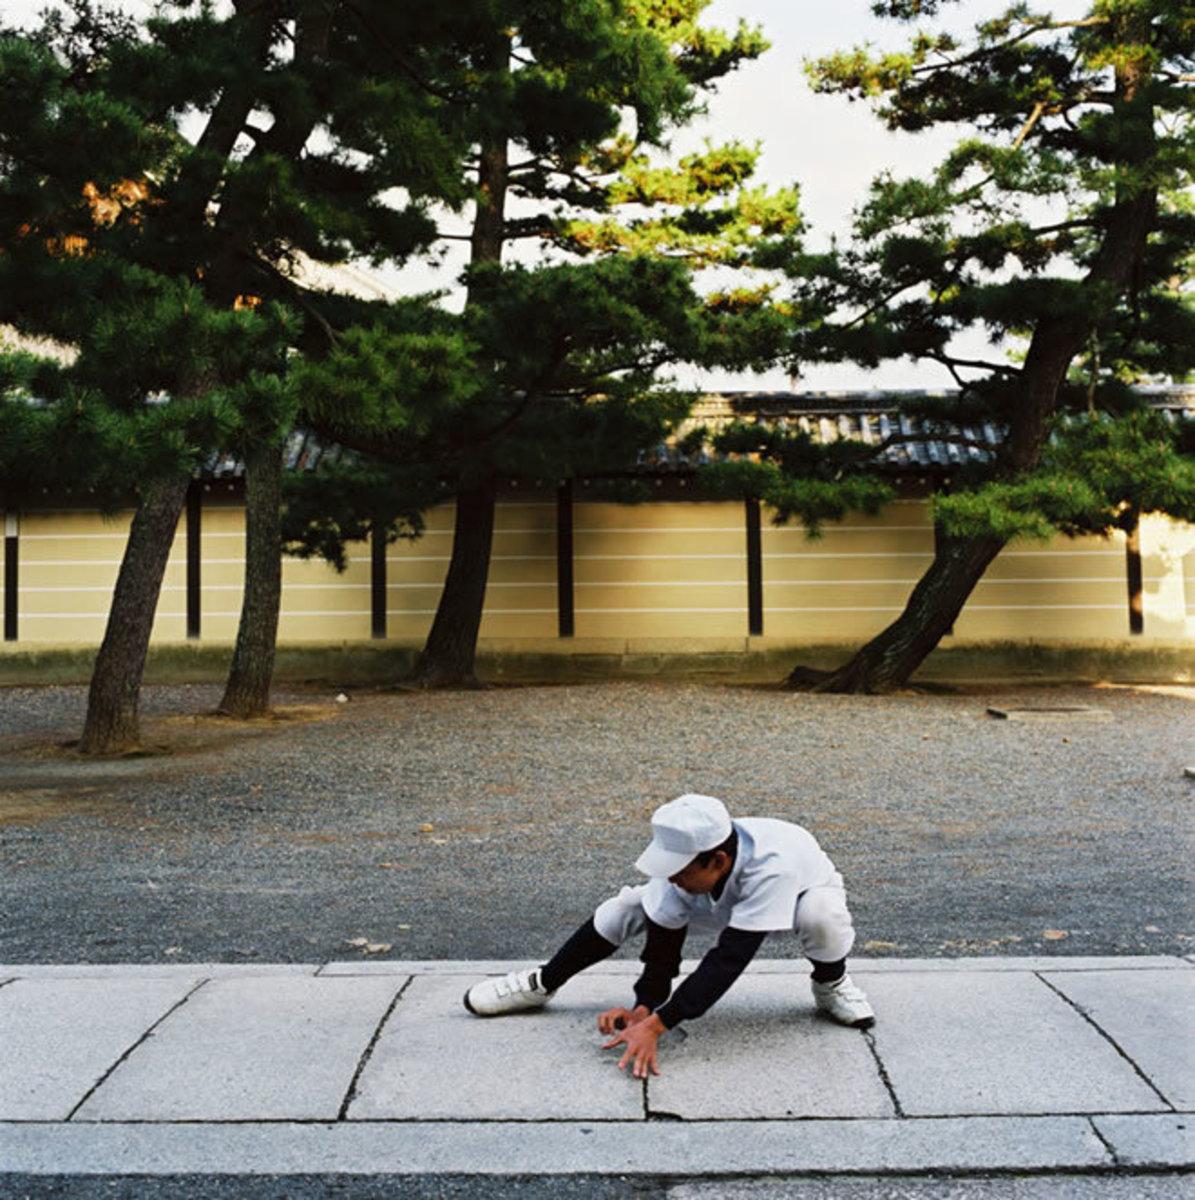 Baseball training, Myoshinji Temple, Kyoto